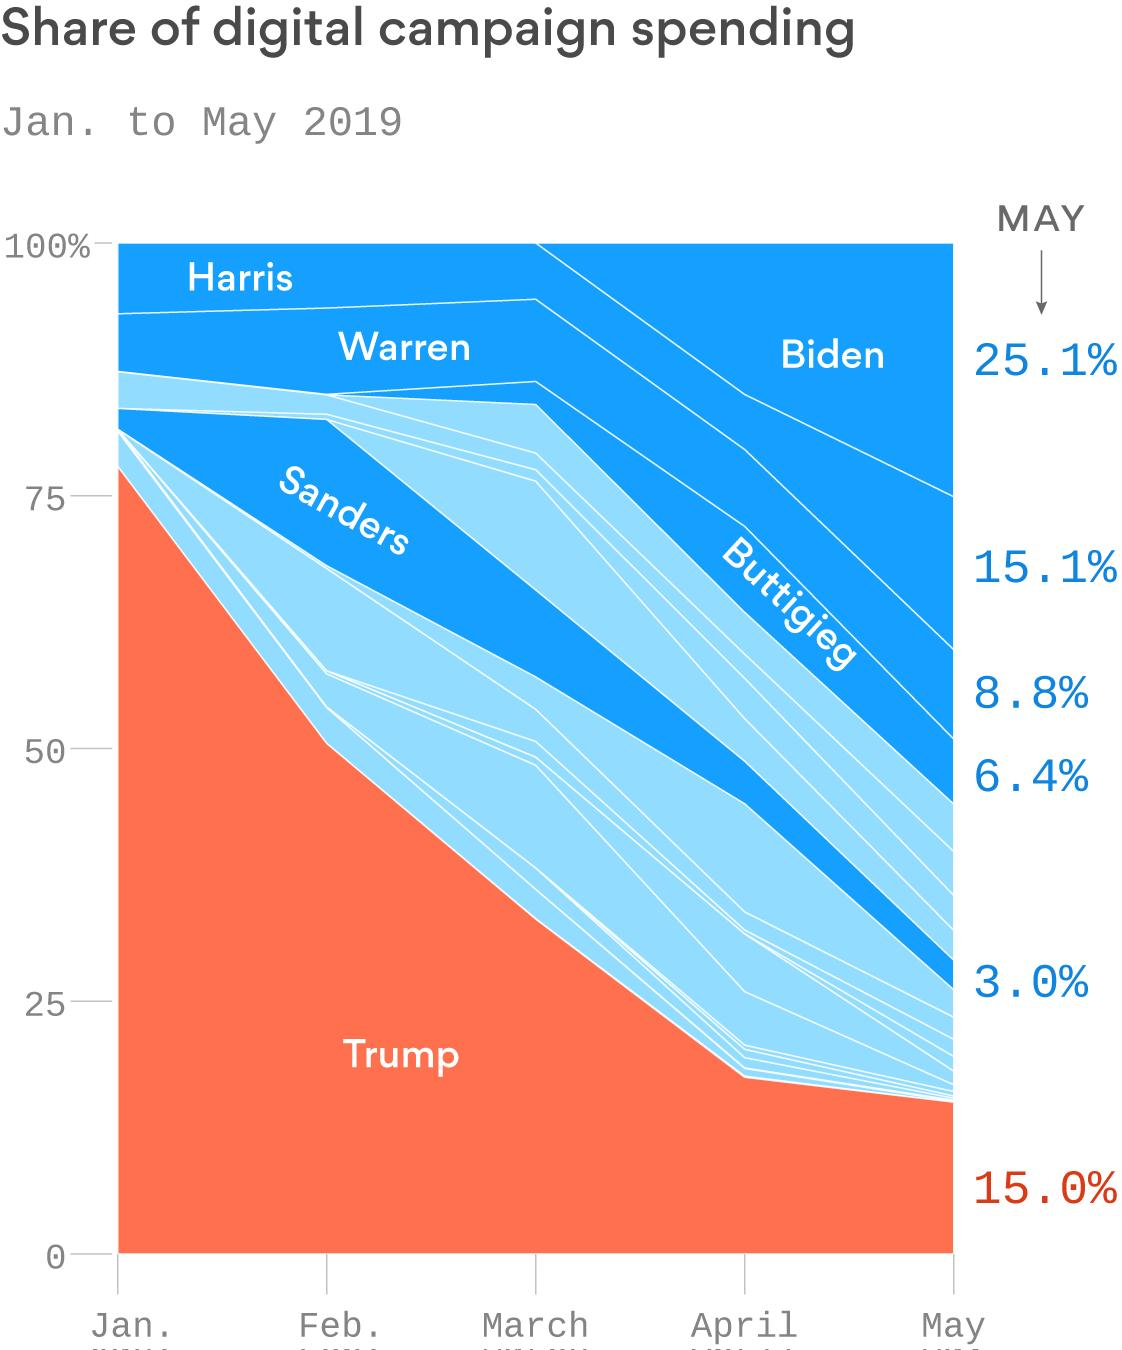 Joe Biden surges past Trump on Facebook and Google spending